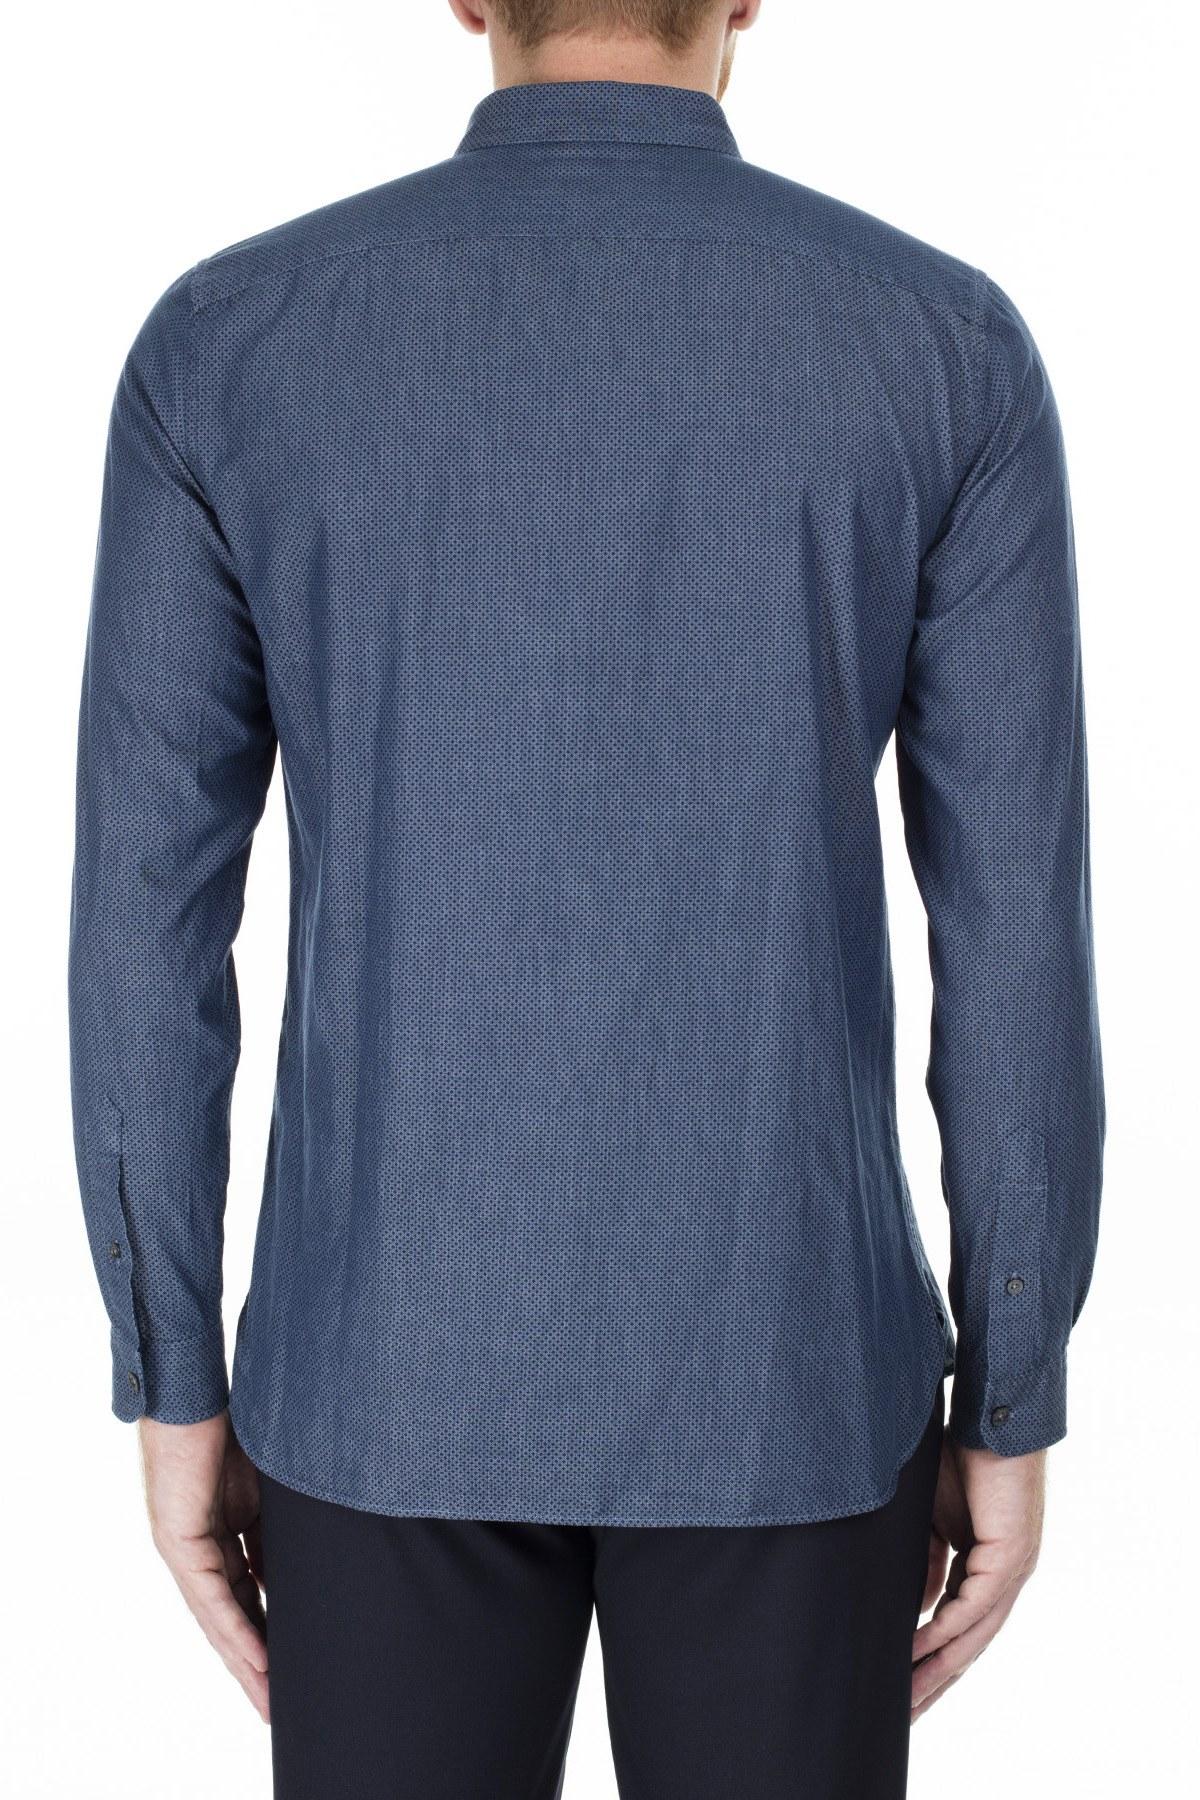 Lacoste Slim Fit Erkek Gömlek CH2043 43L LACİVERT